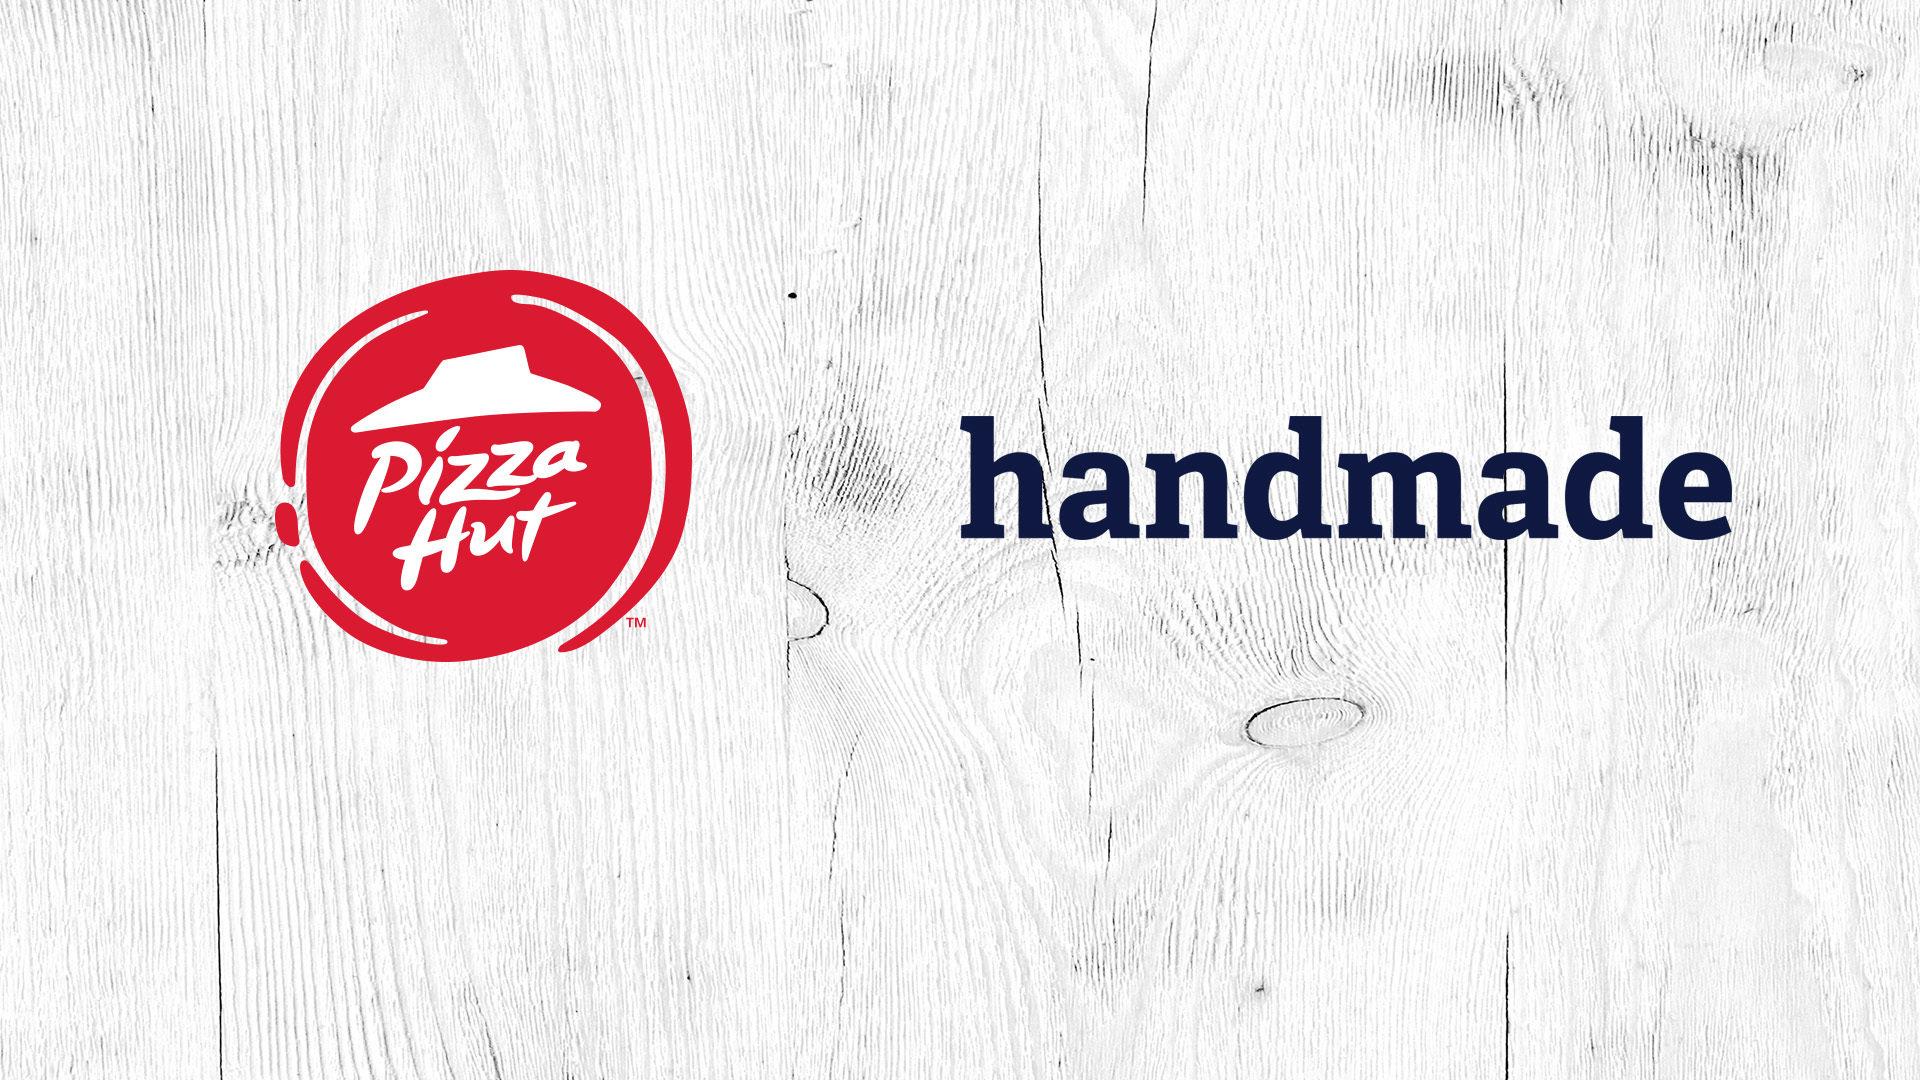 Hand Made socialowo dla marki Pizza Hut